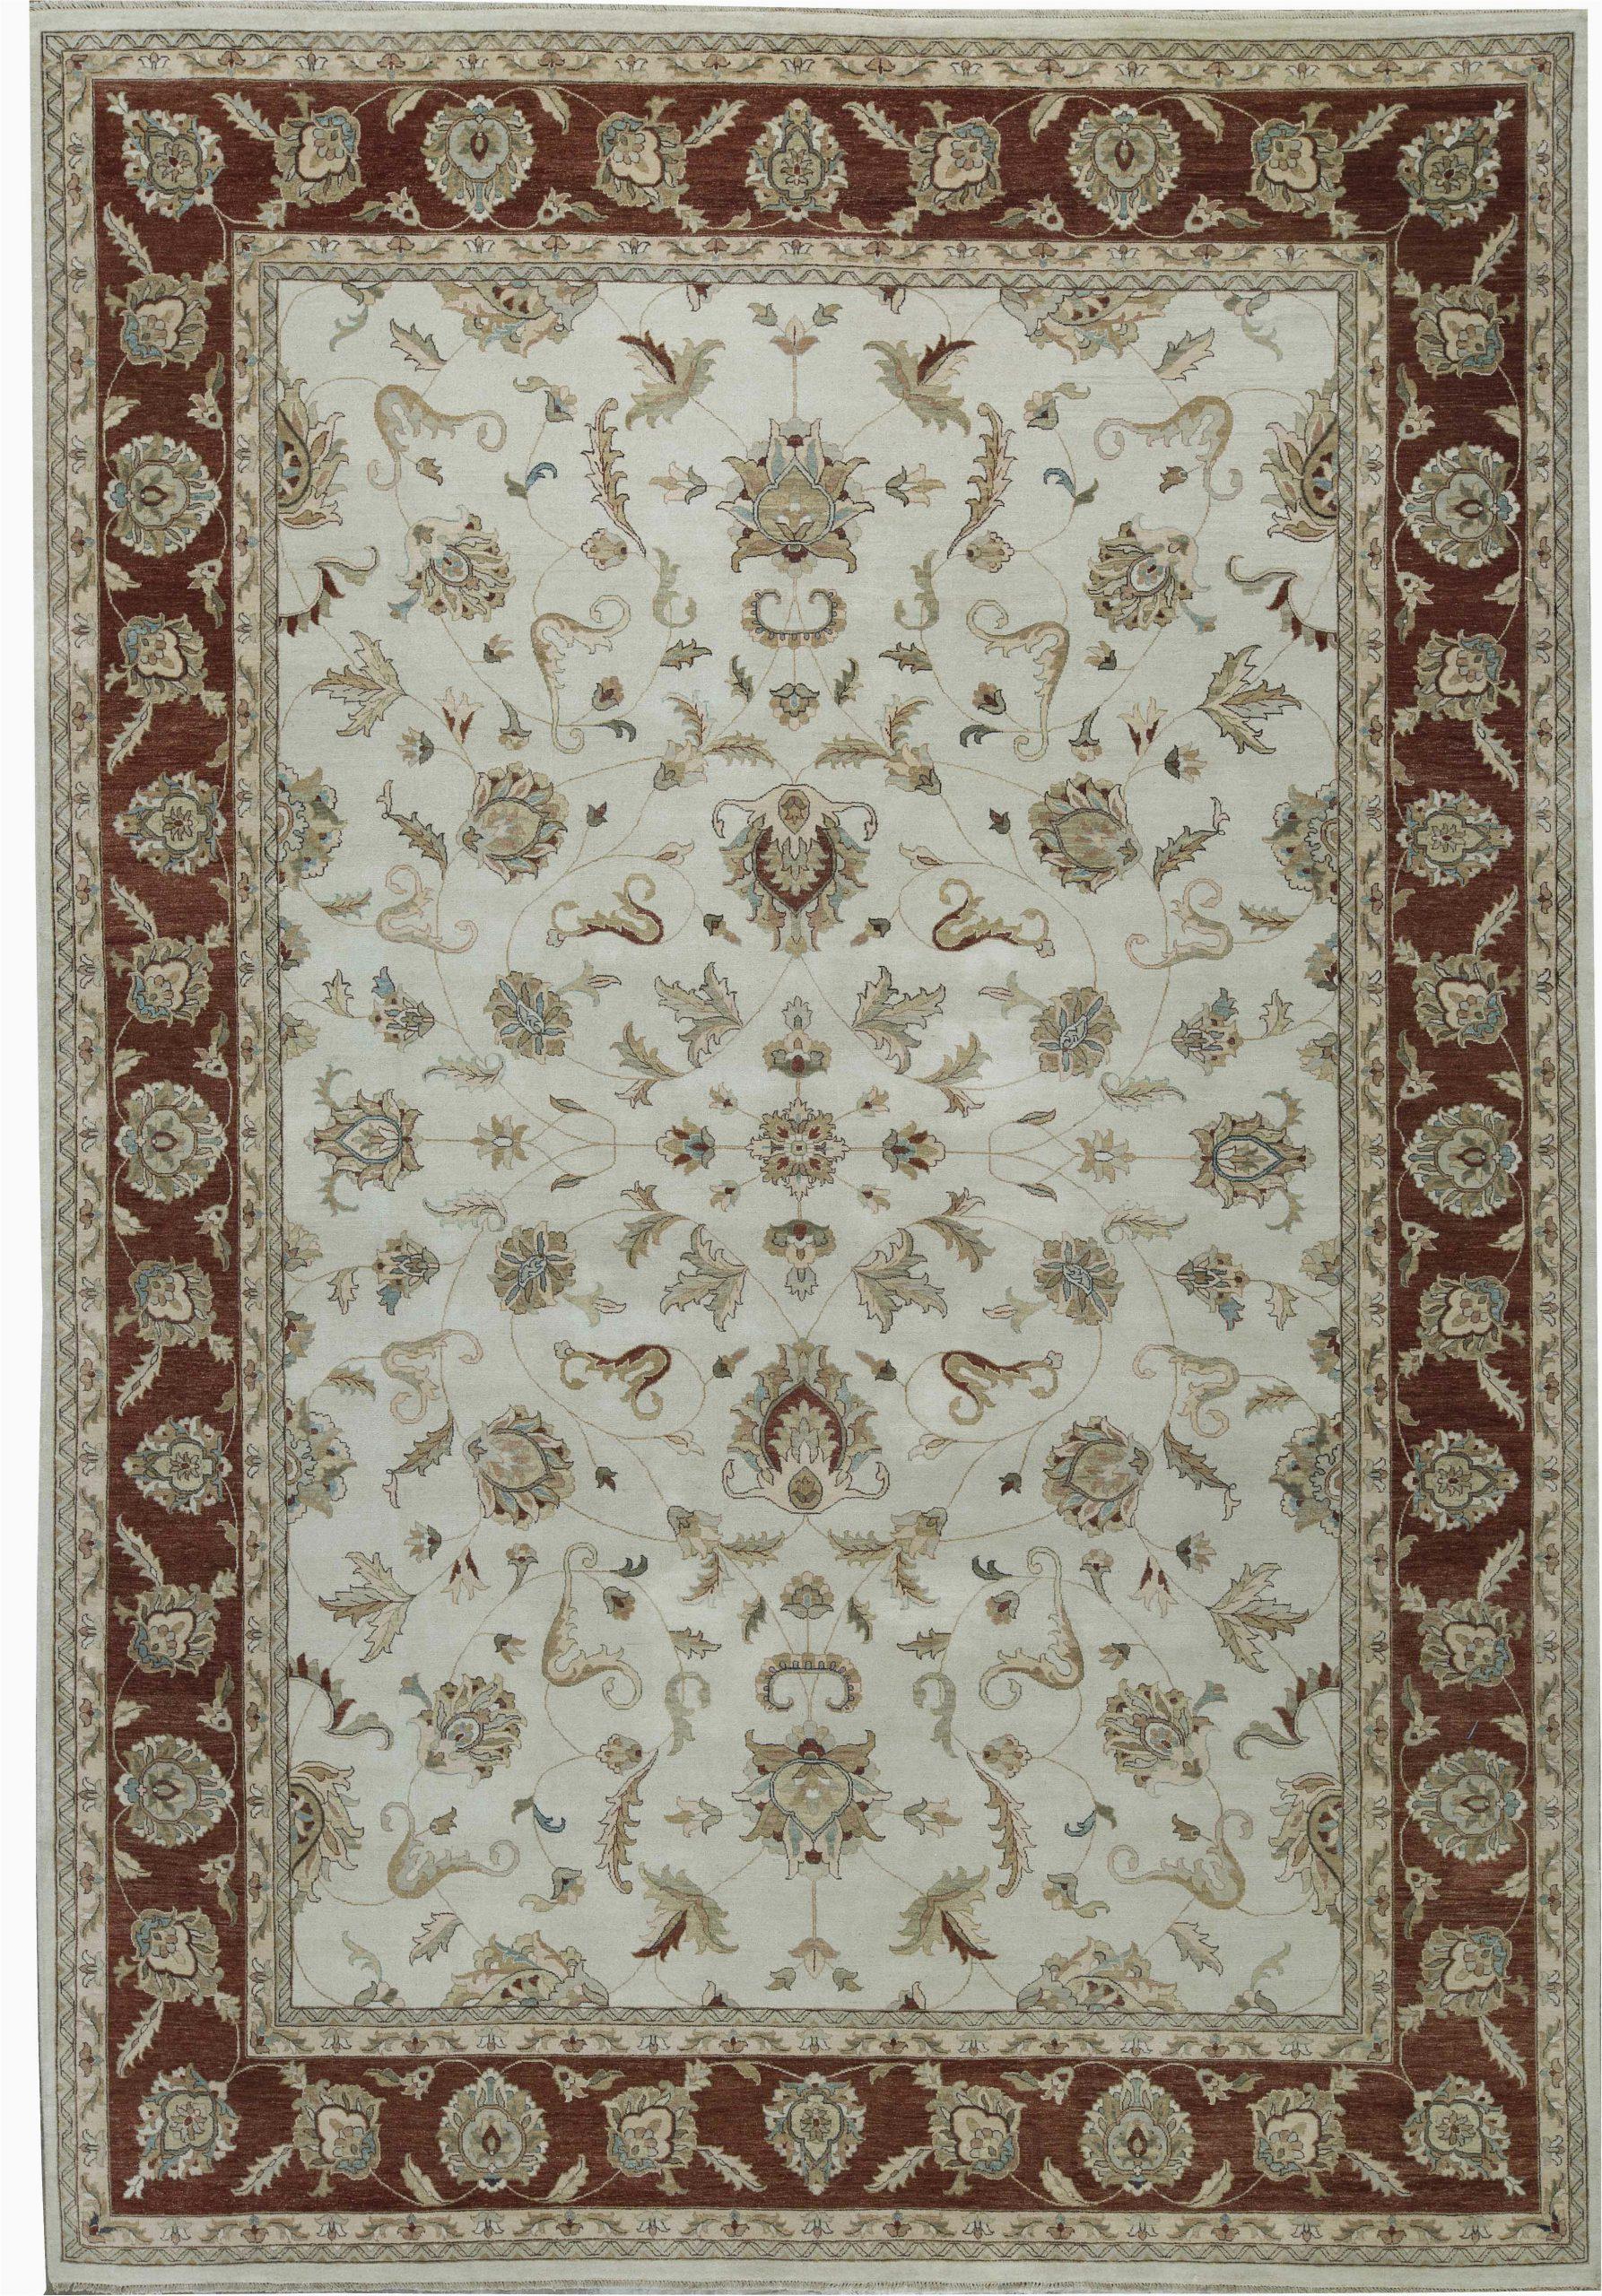 bokara rug co inc one of a kind cornwall handwoven 1110 x 175 wool beige area rug abhd2671